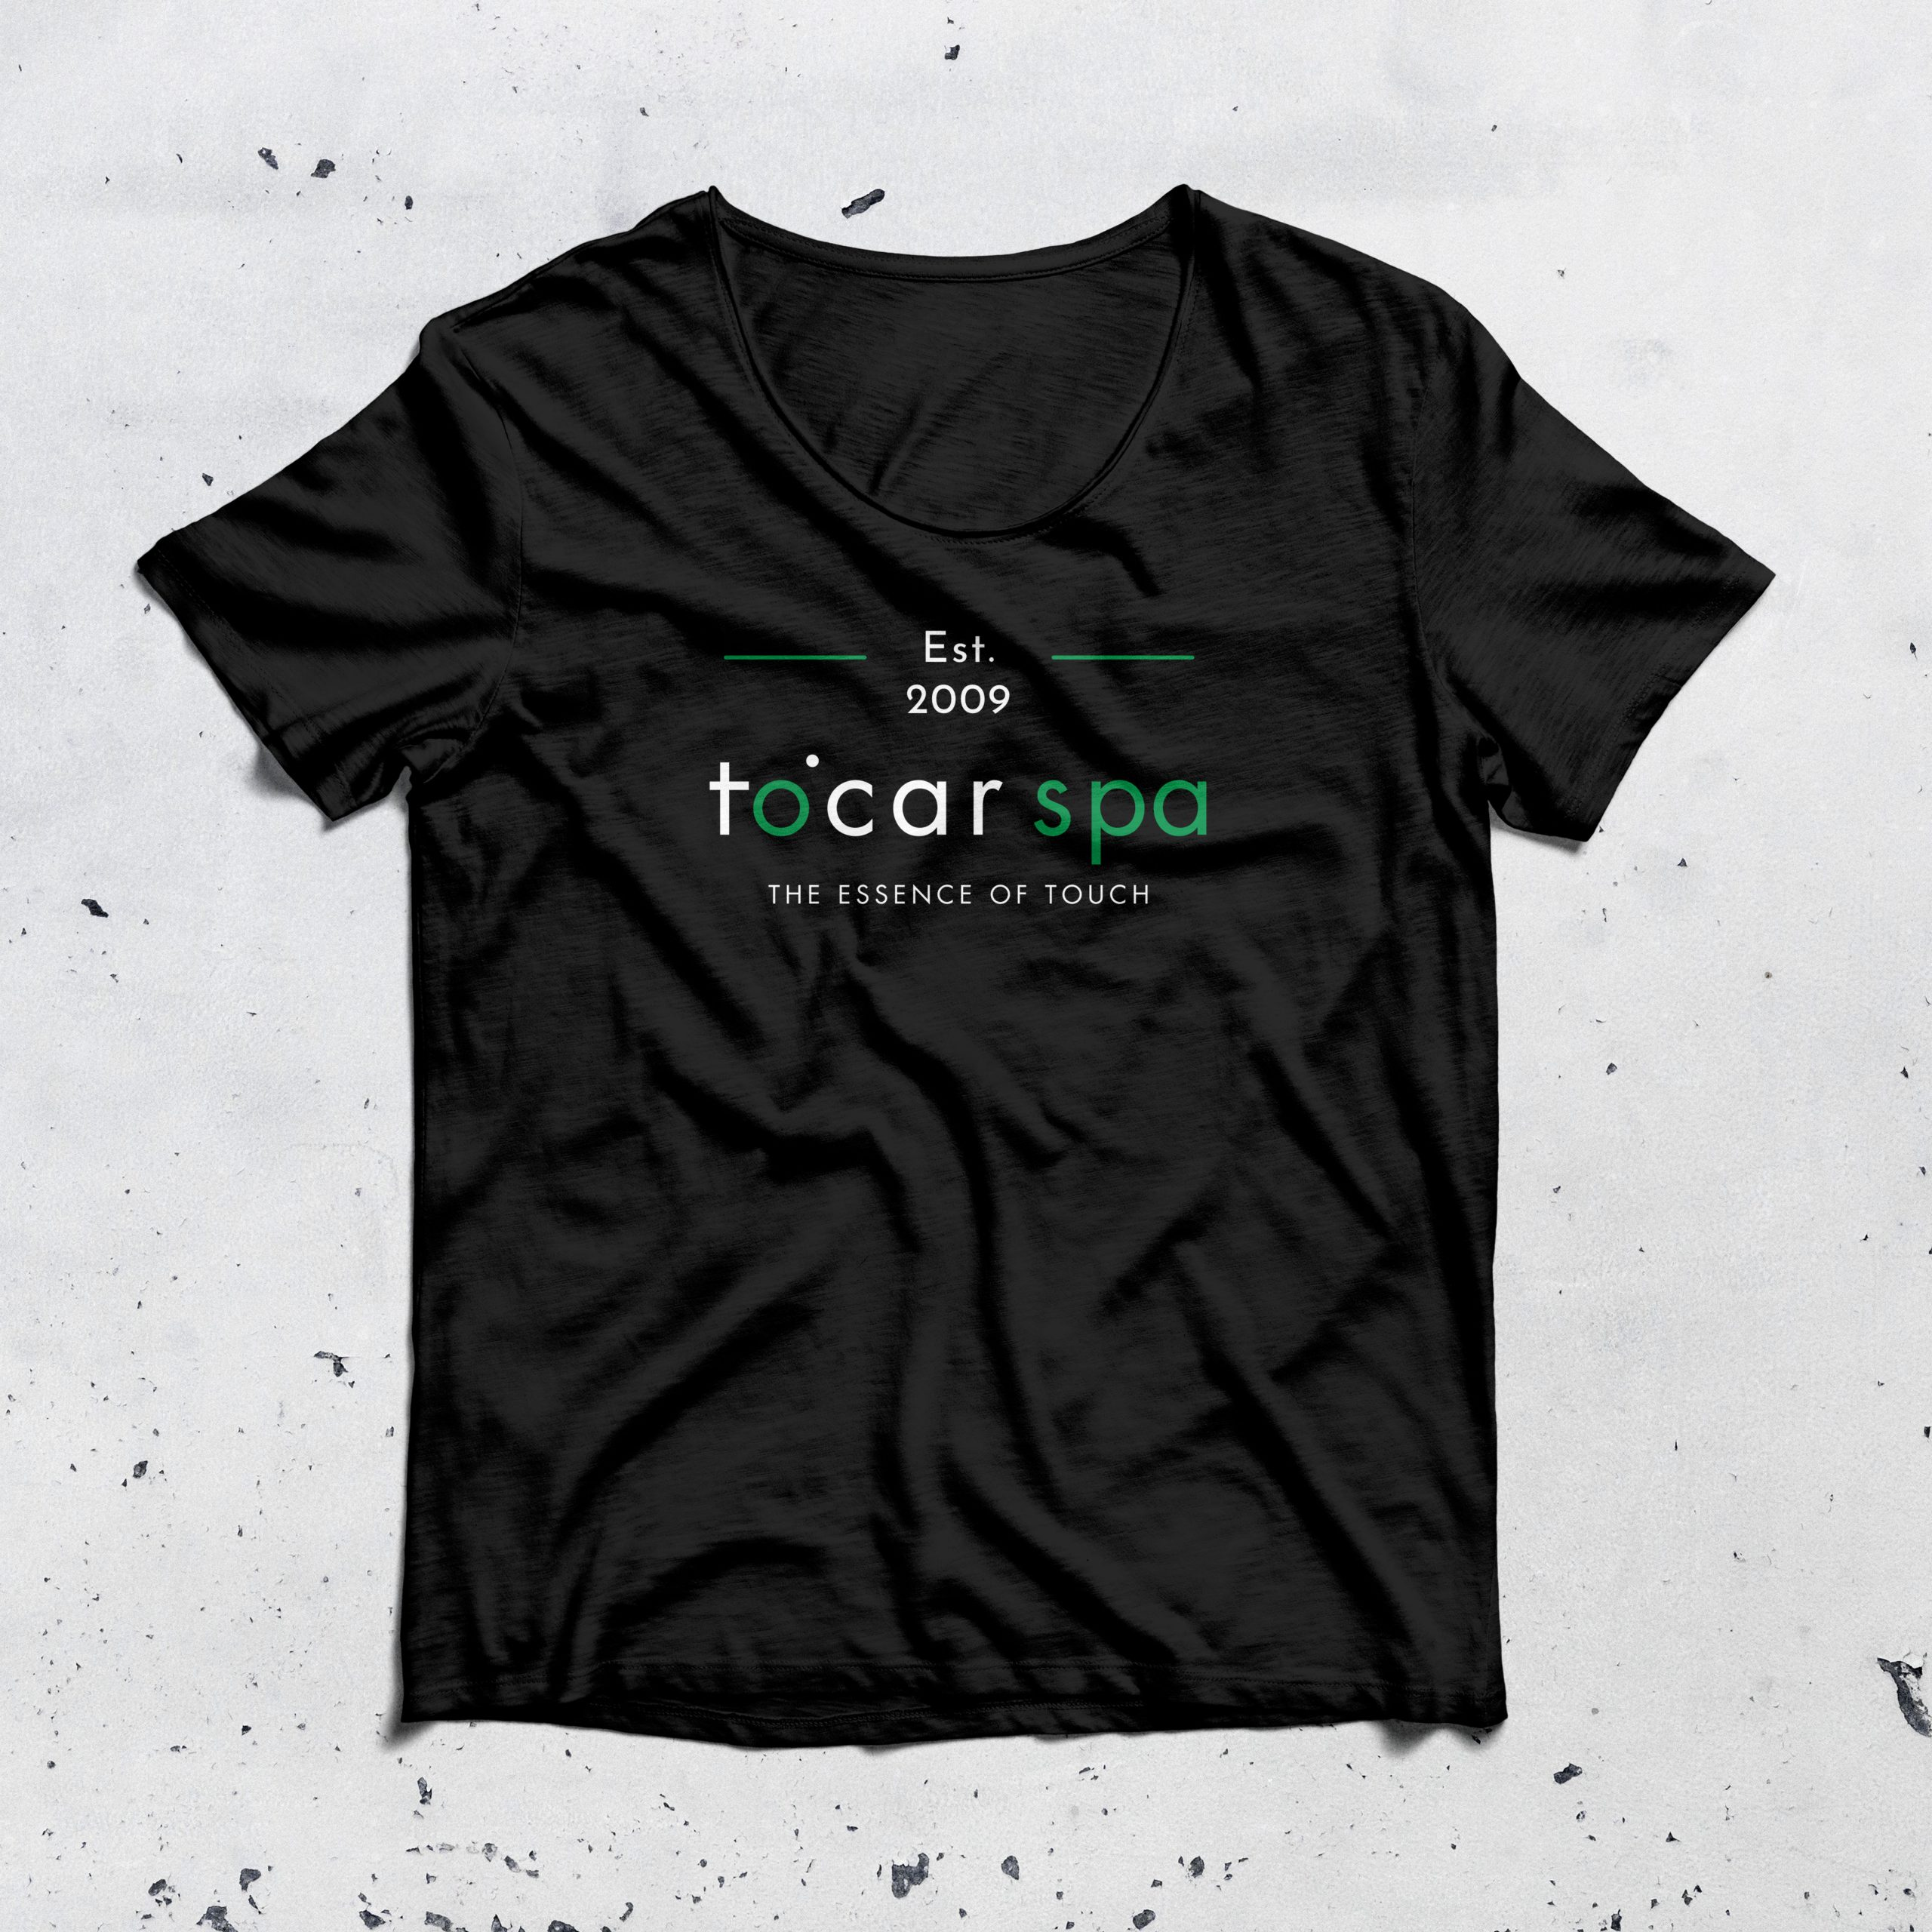 T-shirt design for Tocar Spa by C&V